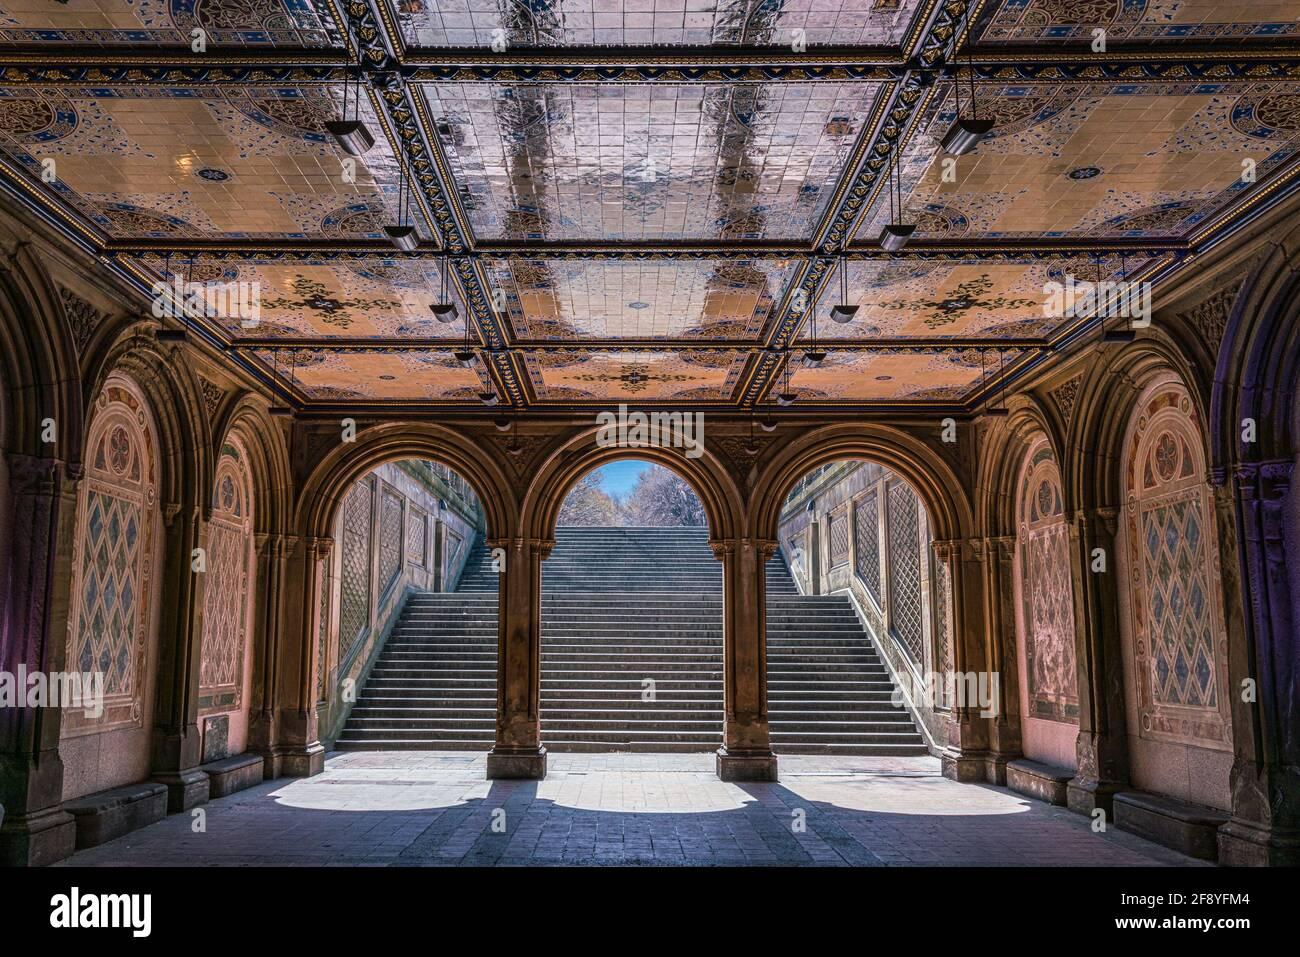 Bethesda Terrace, Central Park, New York Banque D'Images